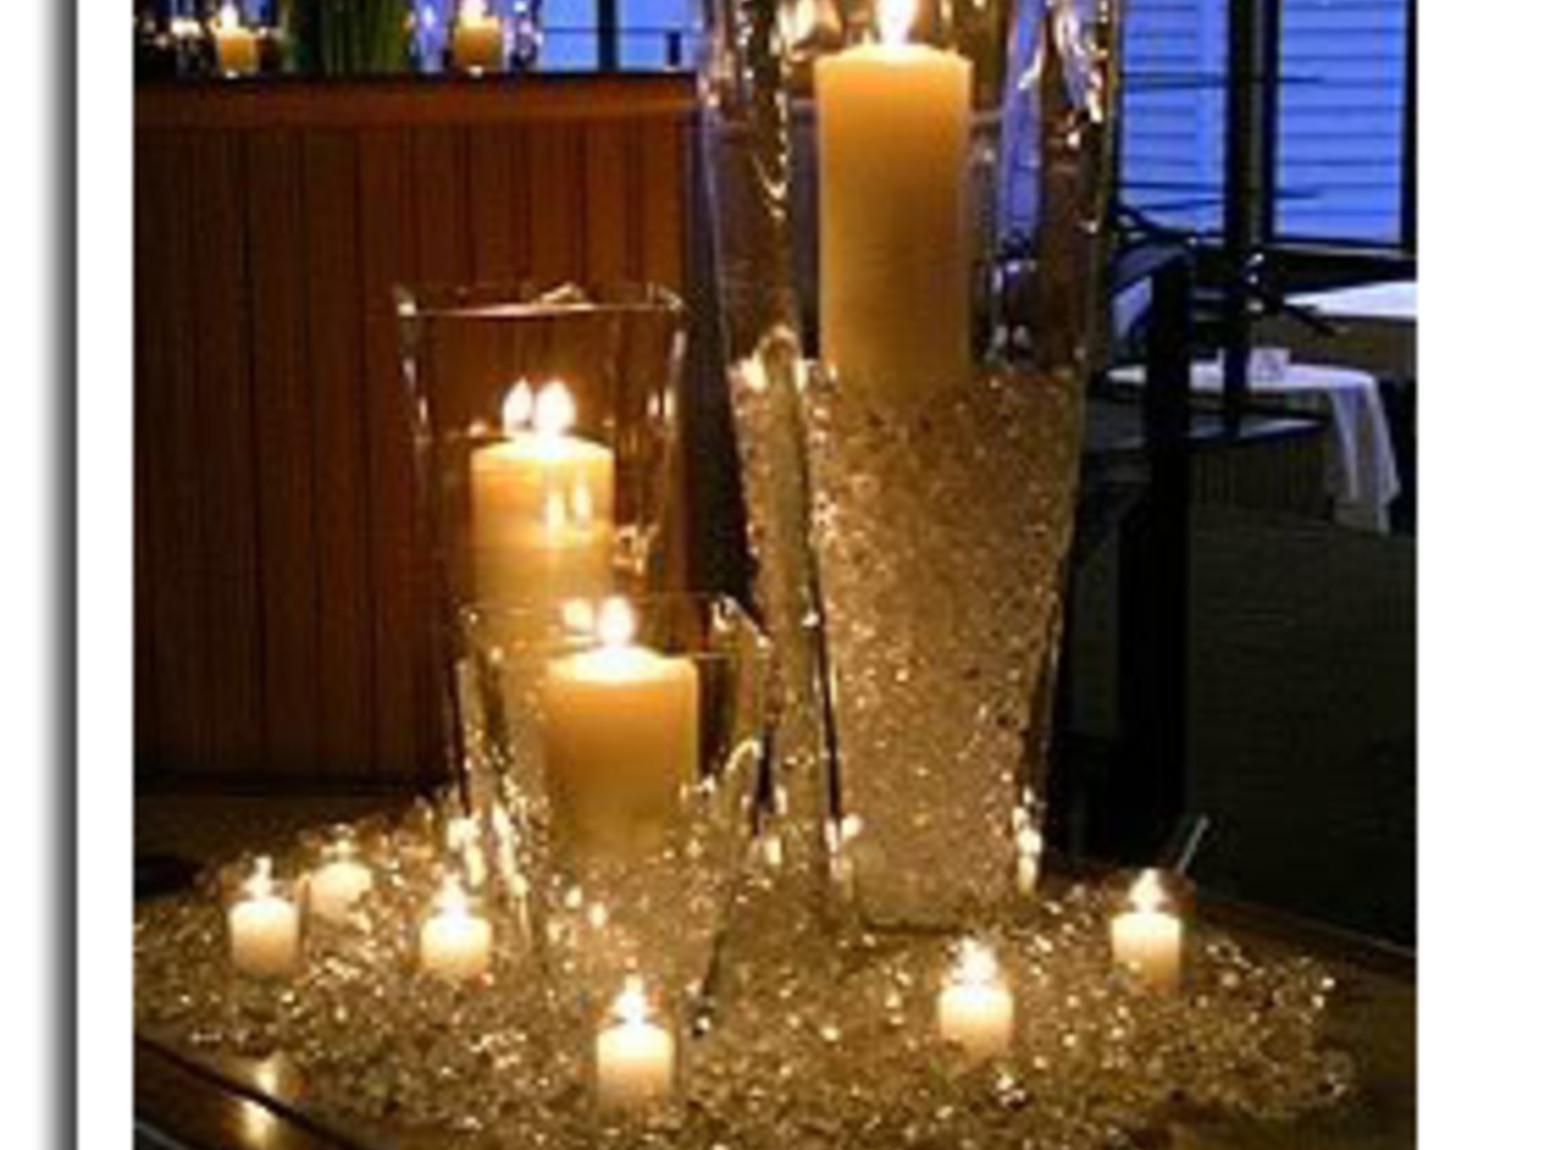 Sparkling diamond themed candle centerpiece recipe just